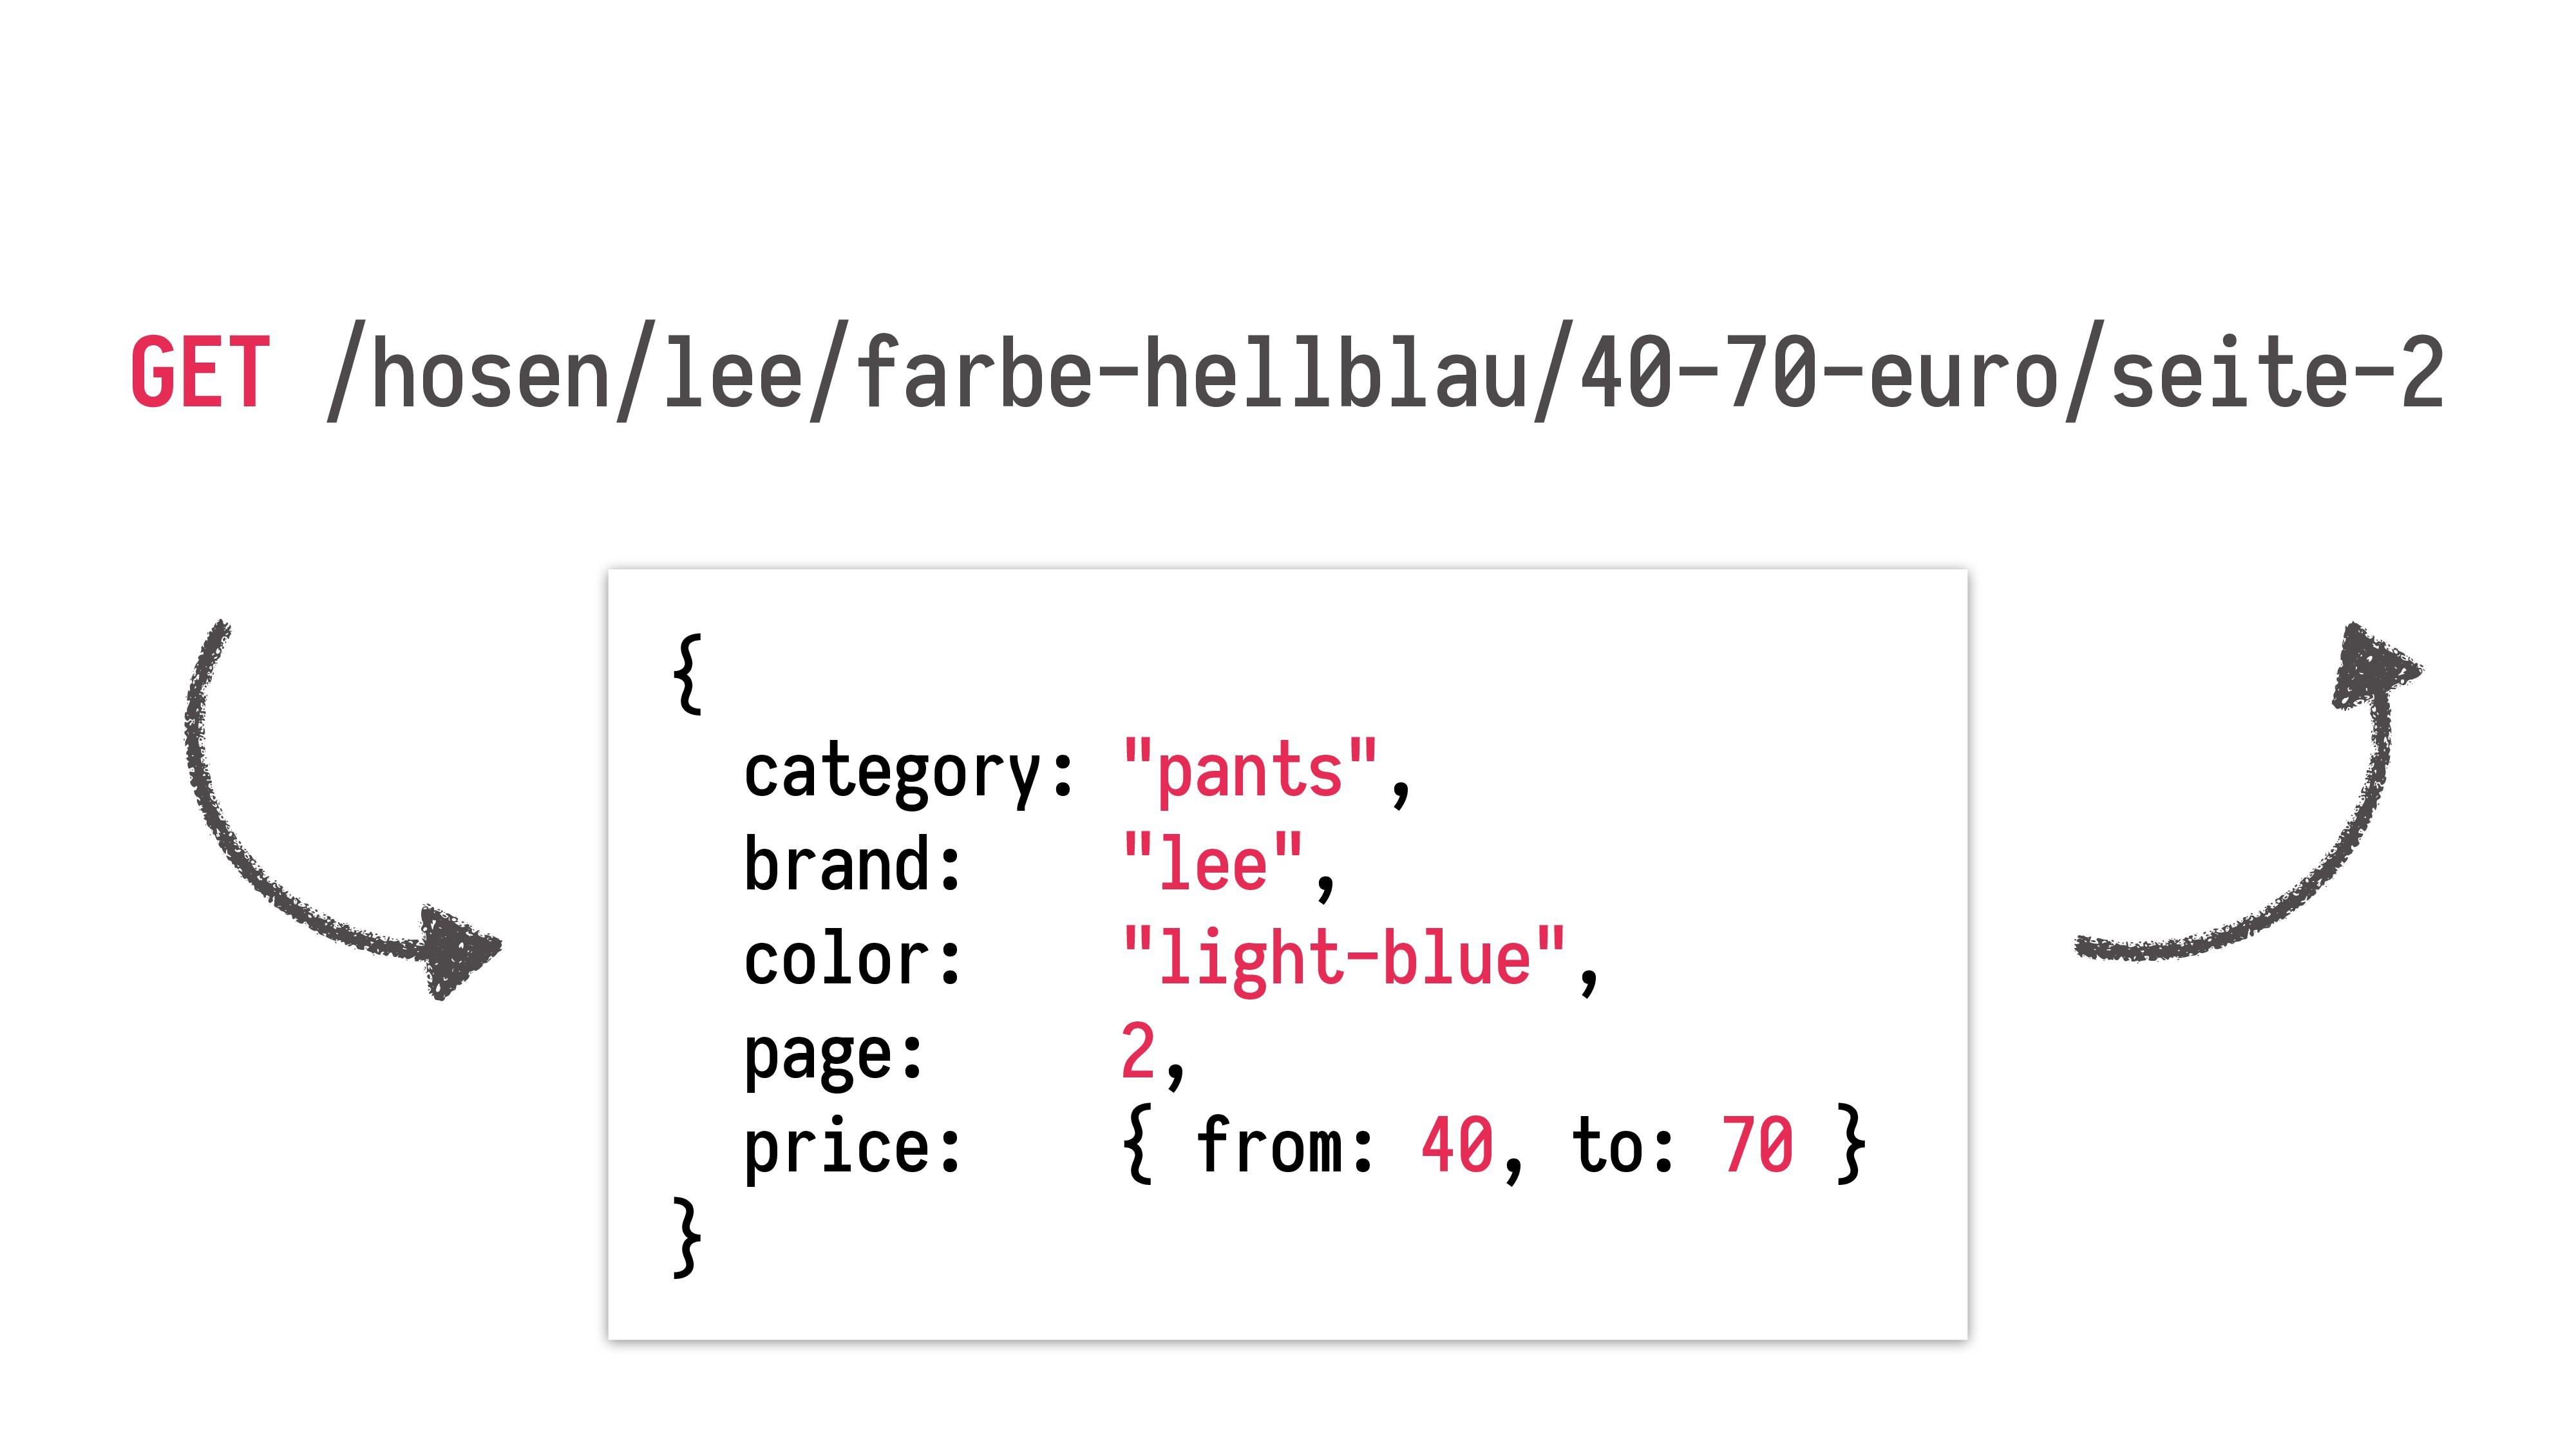 GET /hosen/lee/farbe-hellblau/40-70-euro/seite-...